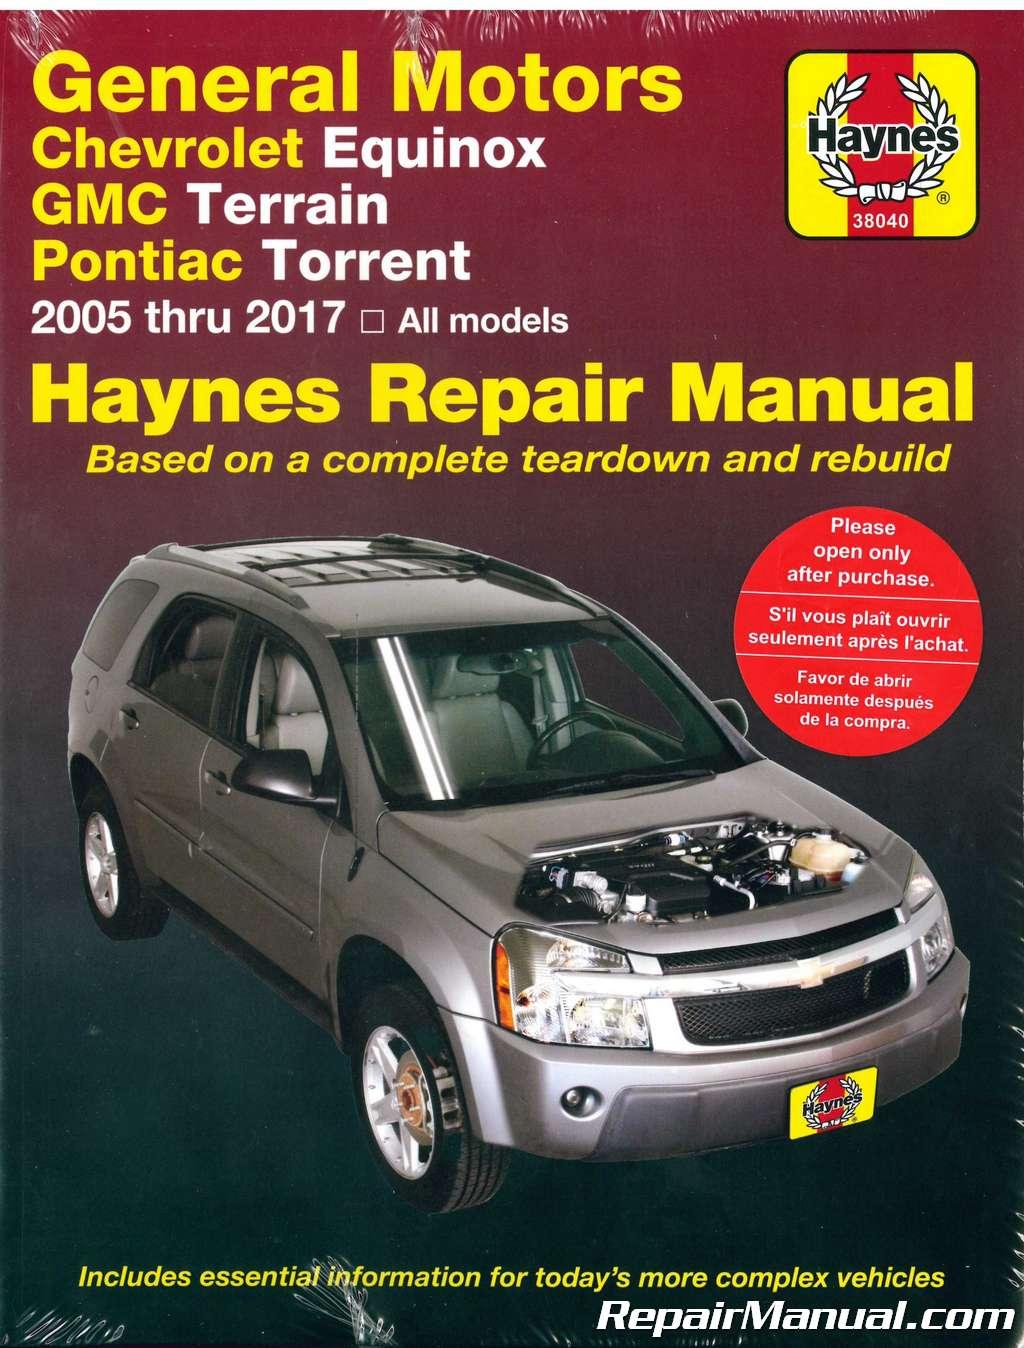 hight resolution of chevrolet equinox gmc terrain pontiac torrent 2005 2017 haynes repair manual